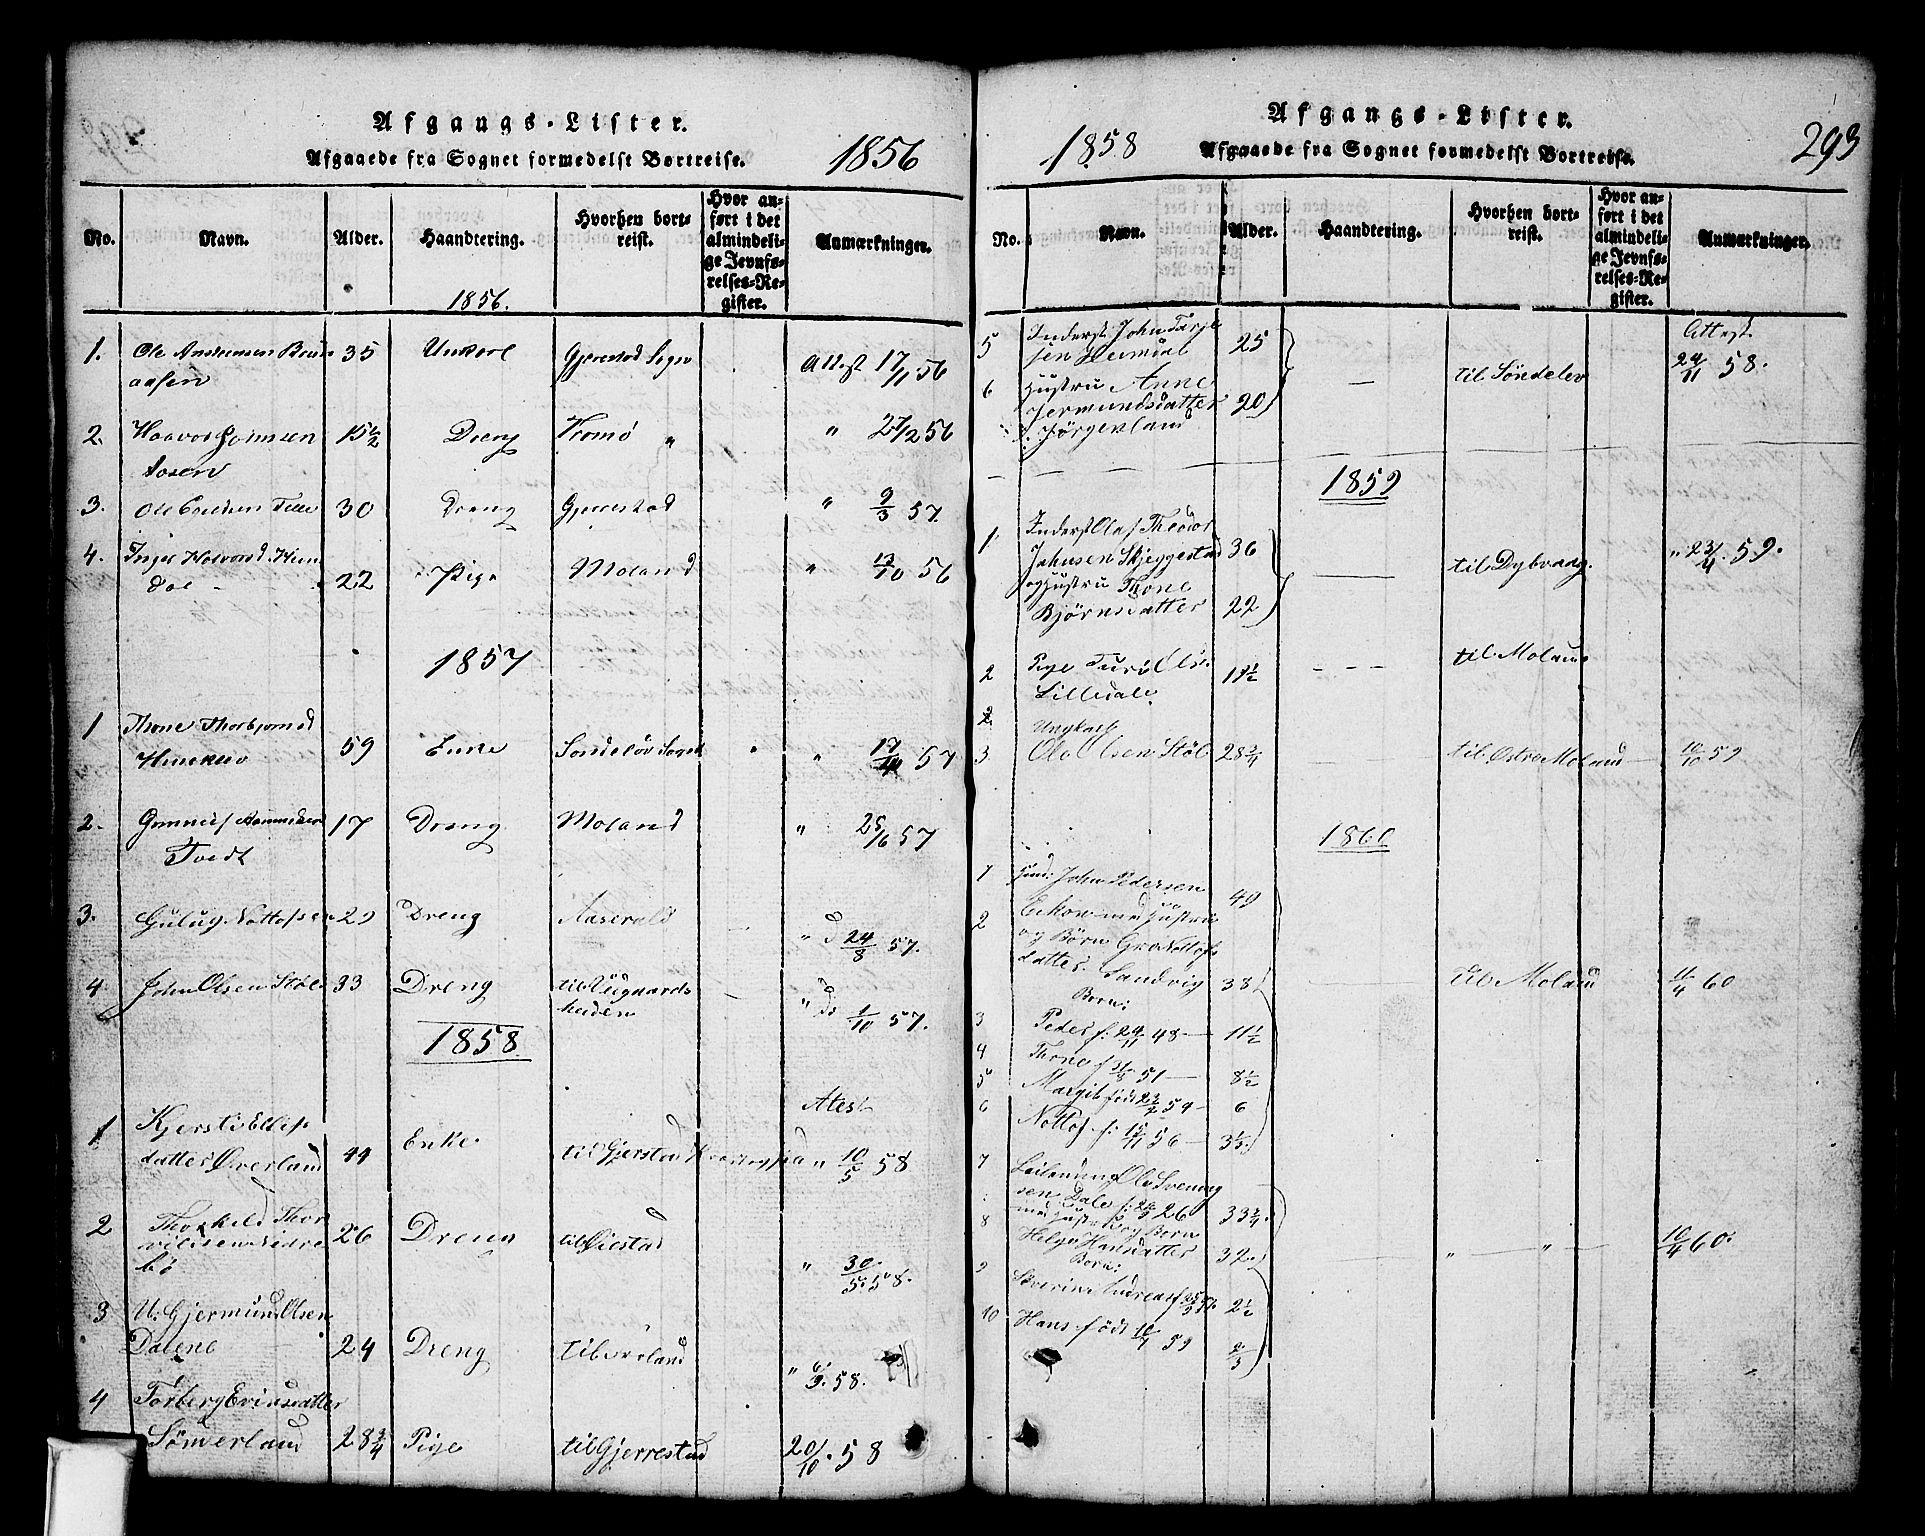 SAKO, Nissedal kirkebøker, G/Gb/L0001: Klokkerbok nr. II 1, 1814-1862, s. 293